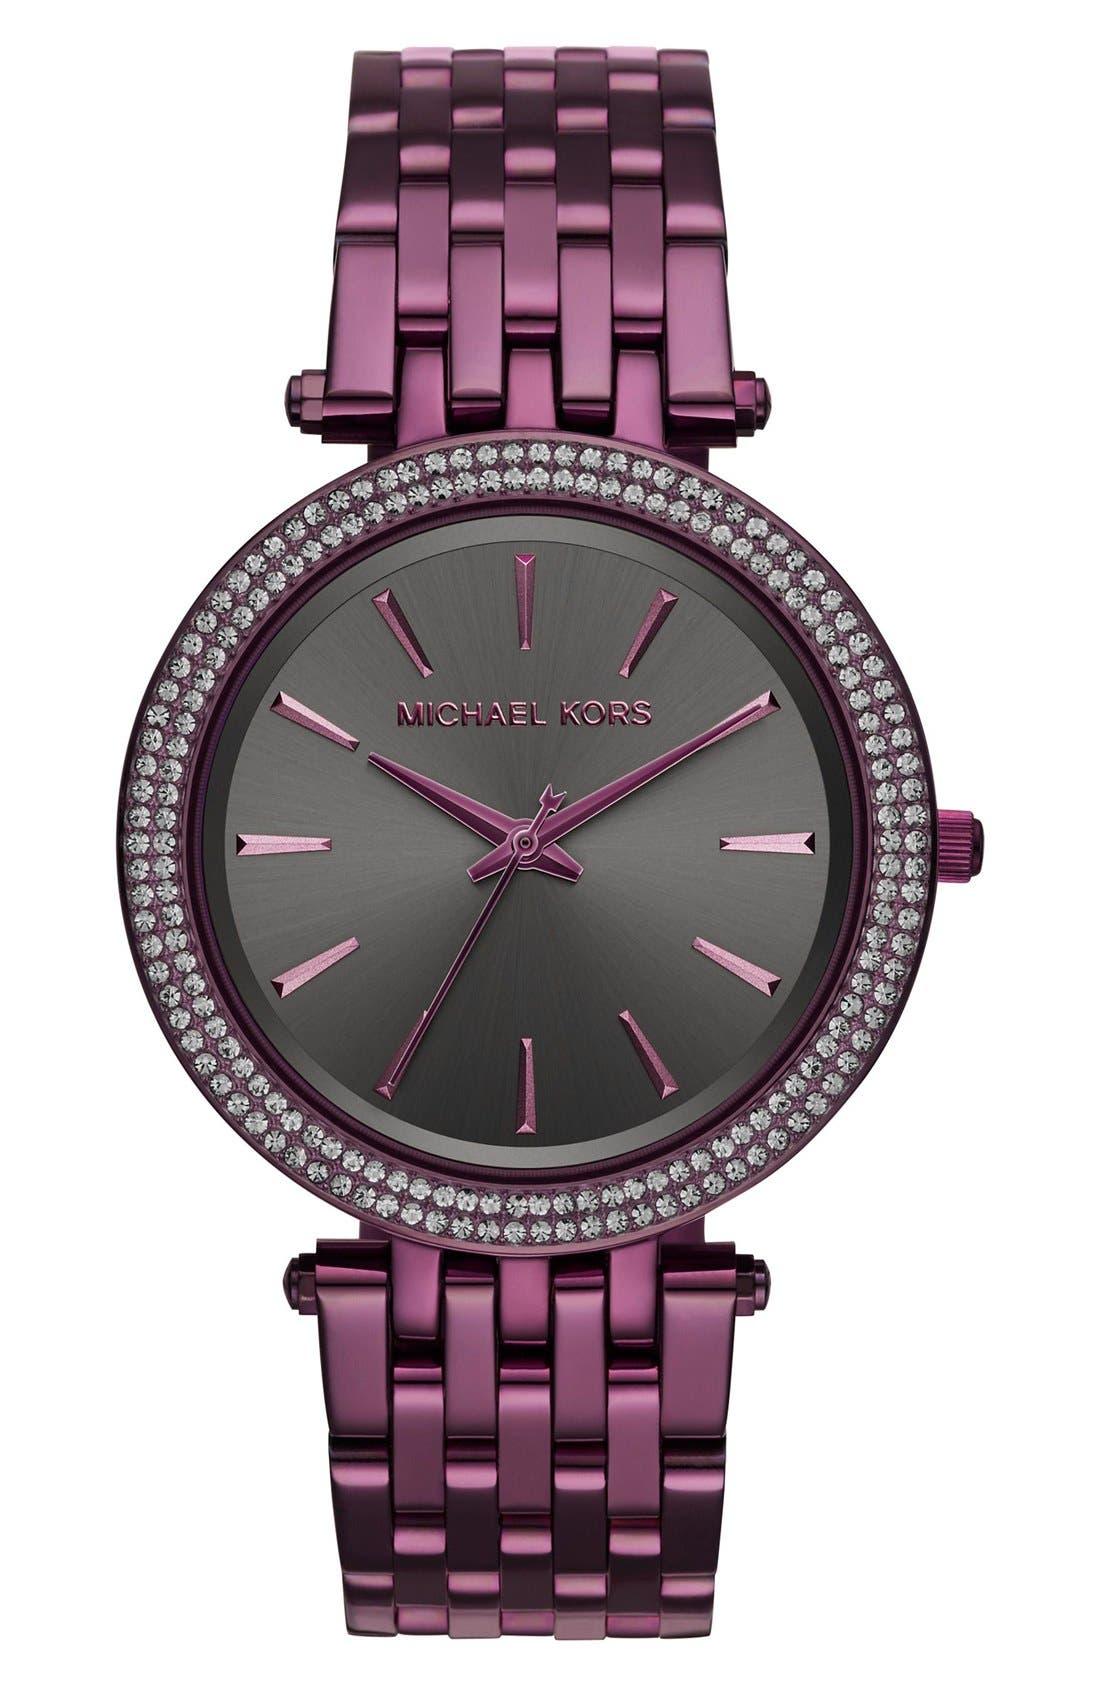 MICHAEL KORS Darci Bracelet Watch, 39mm